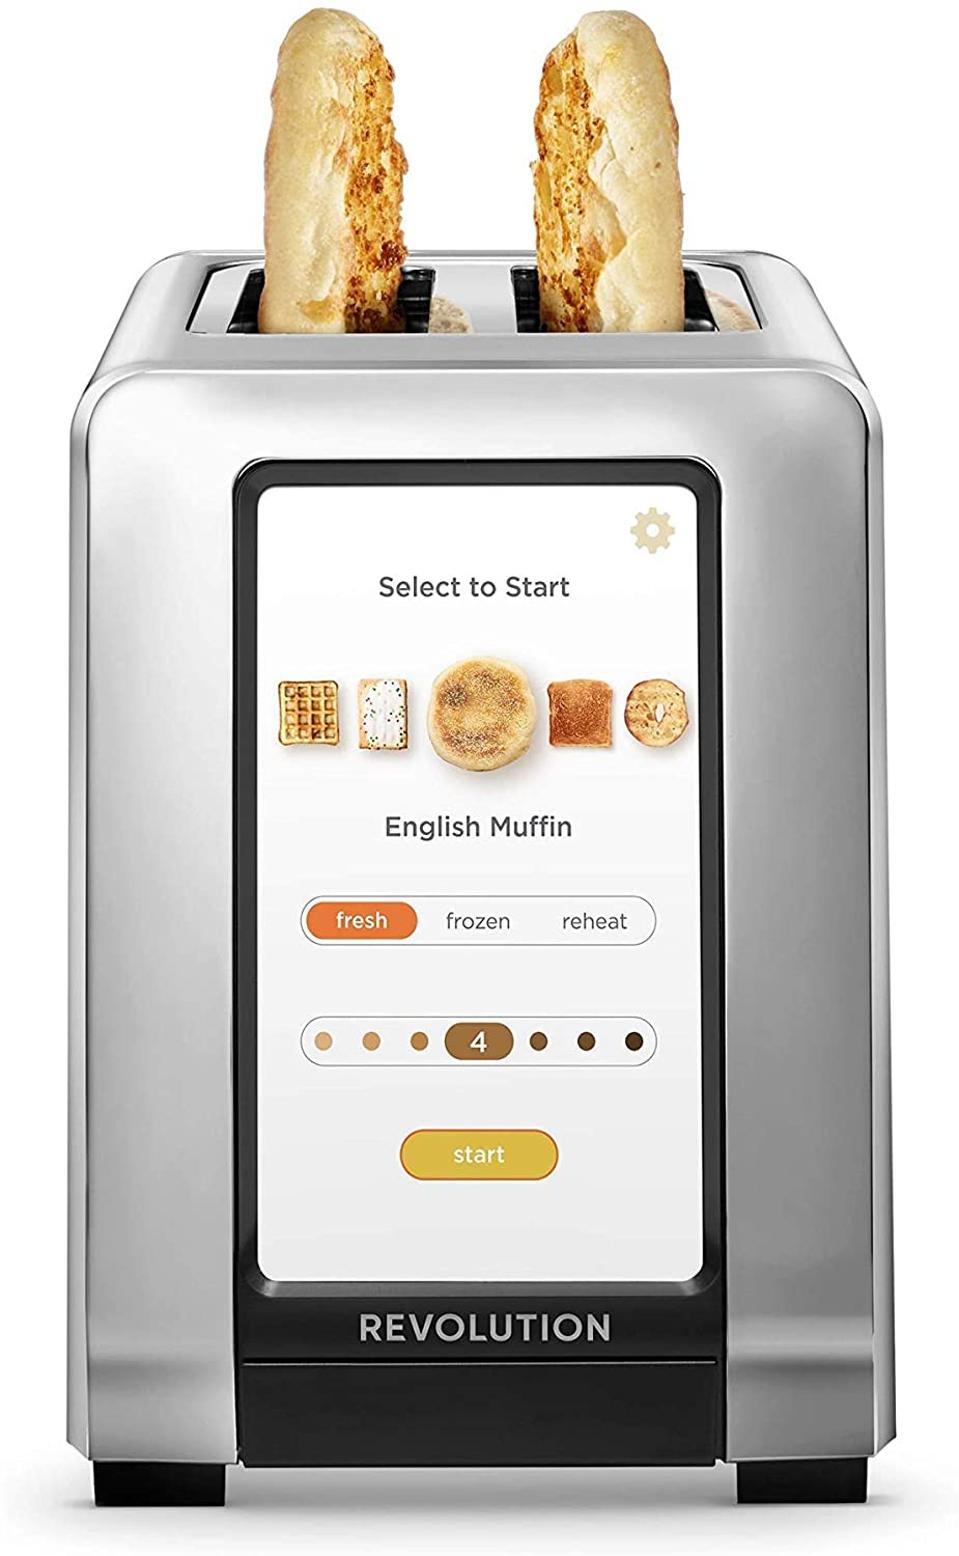 Revolution High Speed Smart Toaster